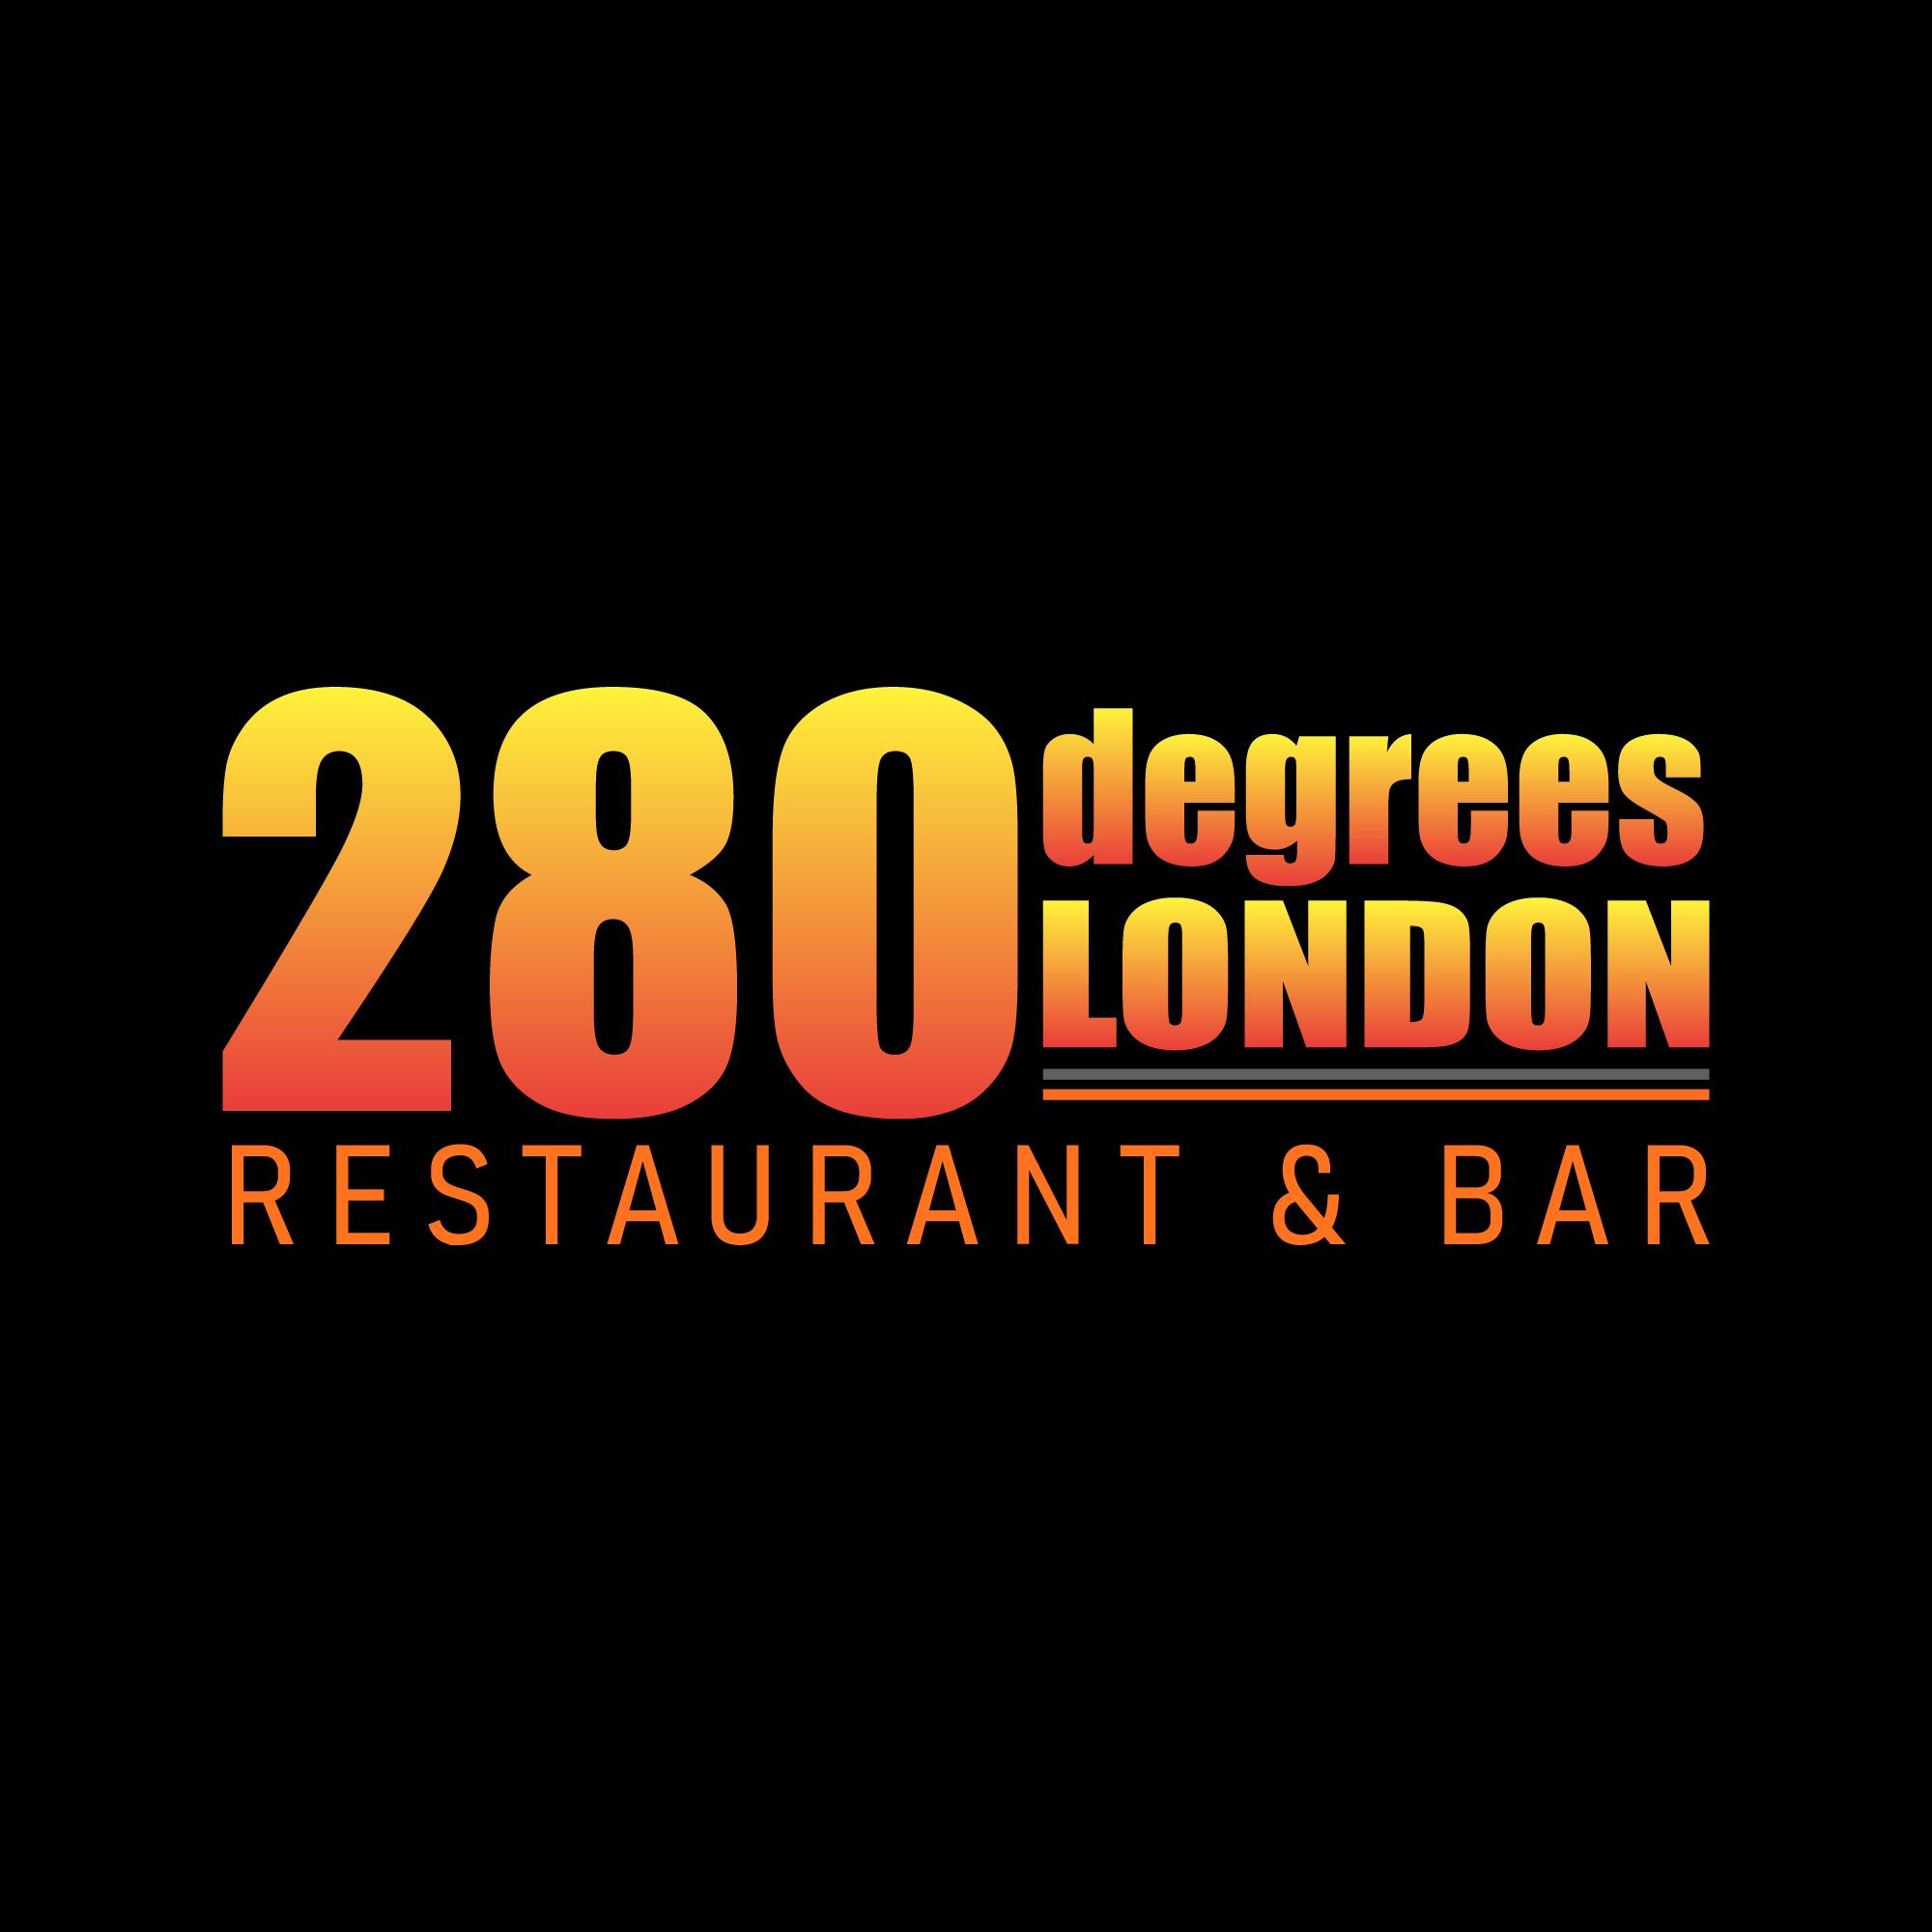 280 degrees